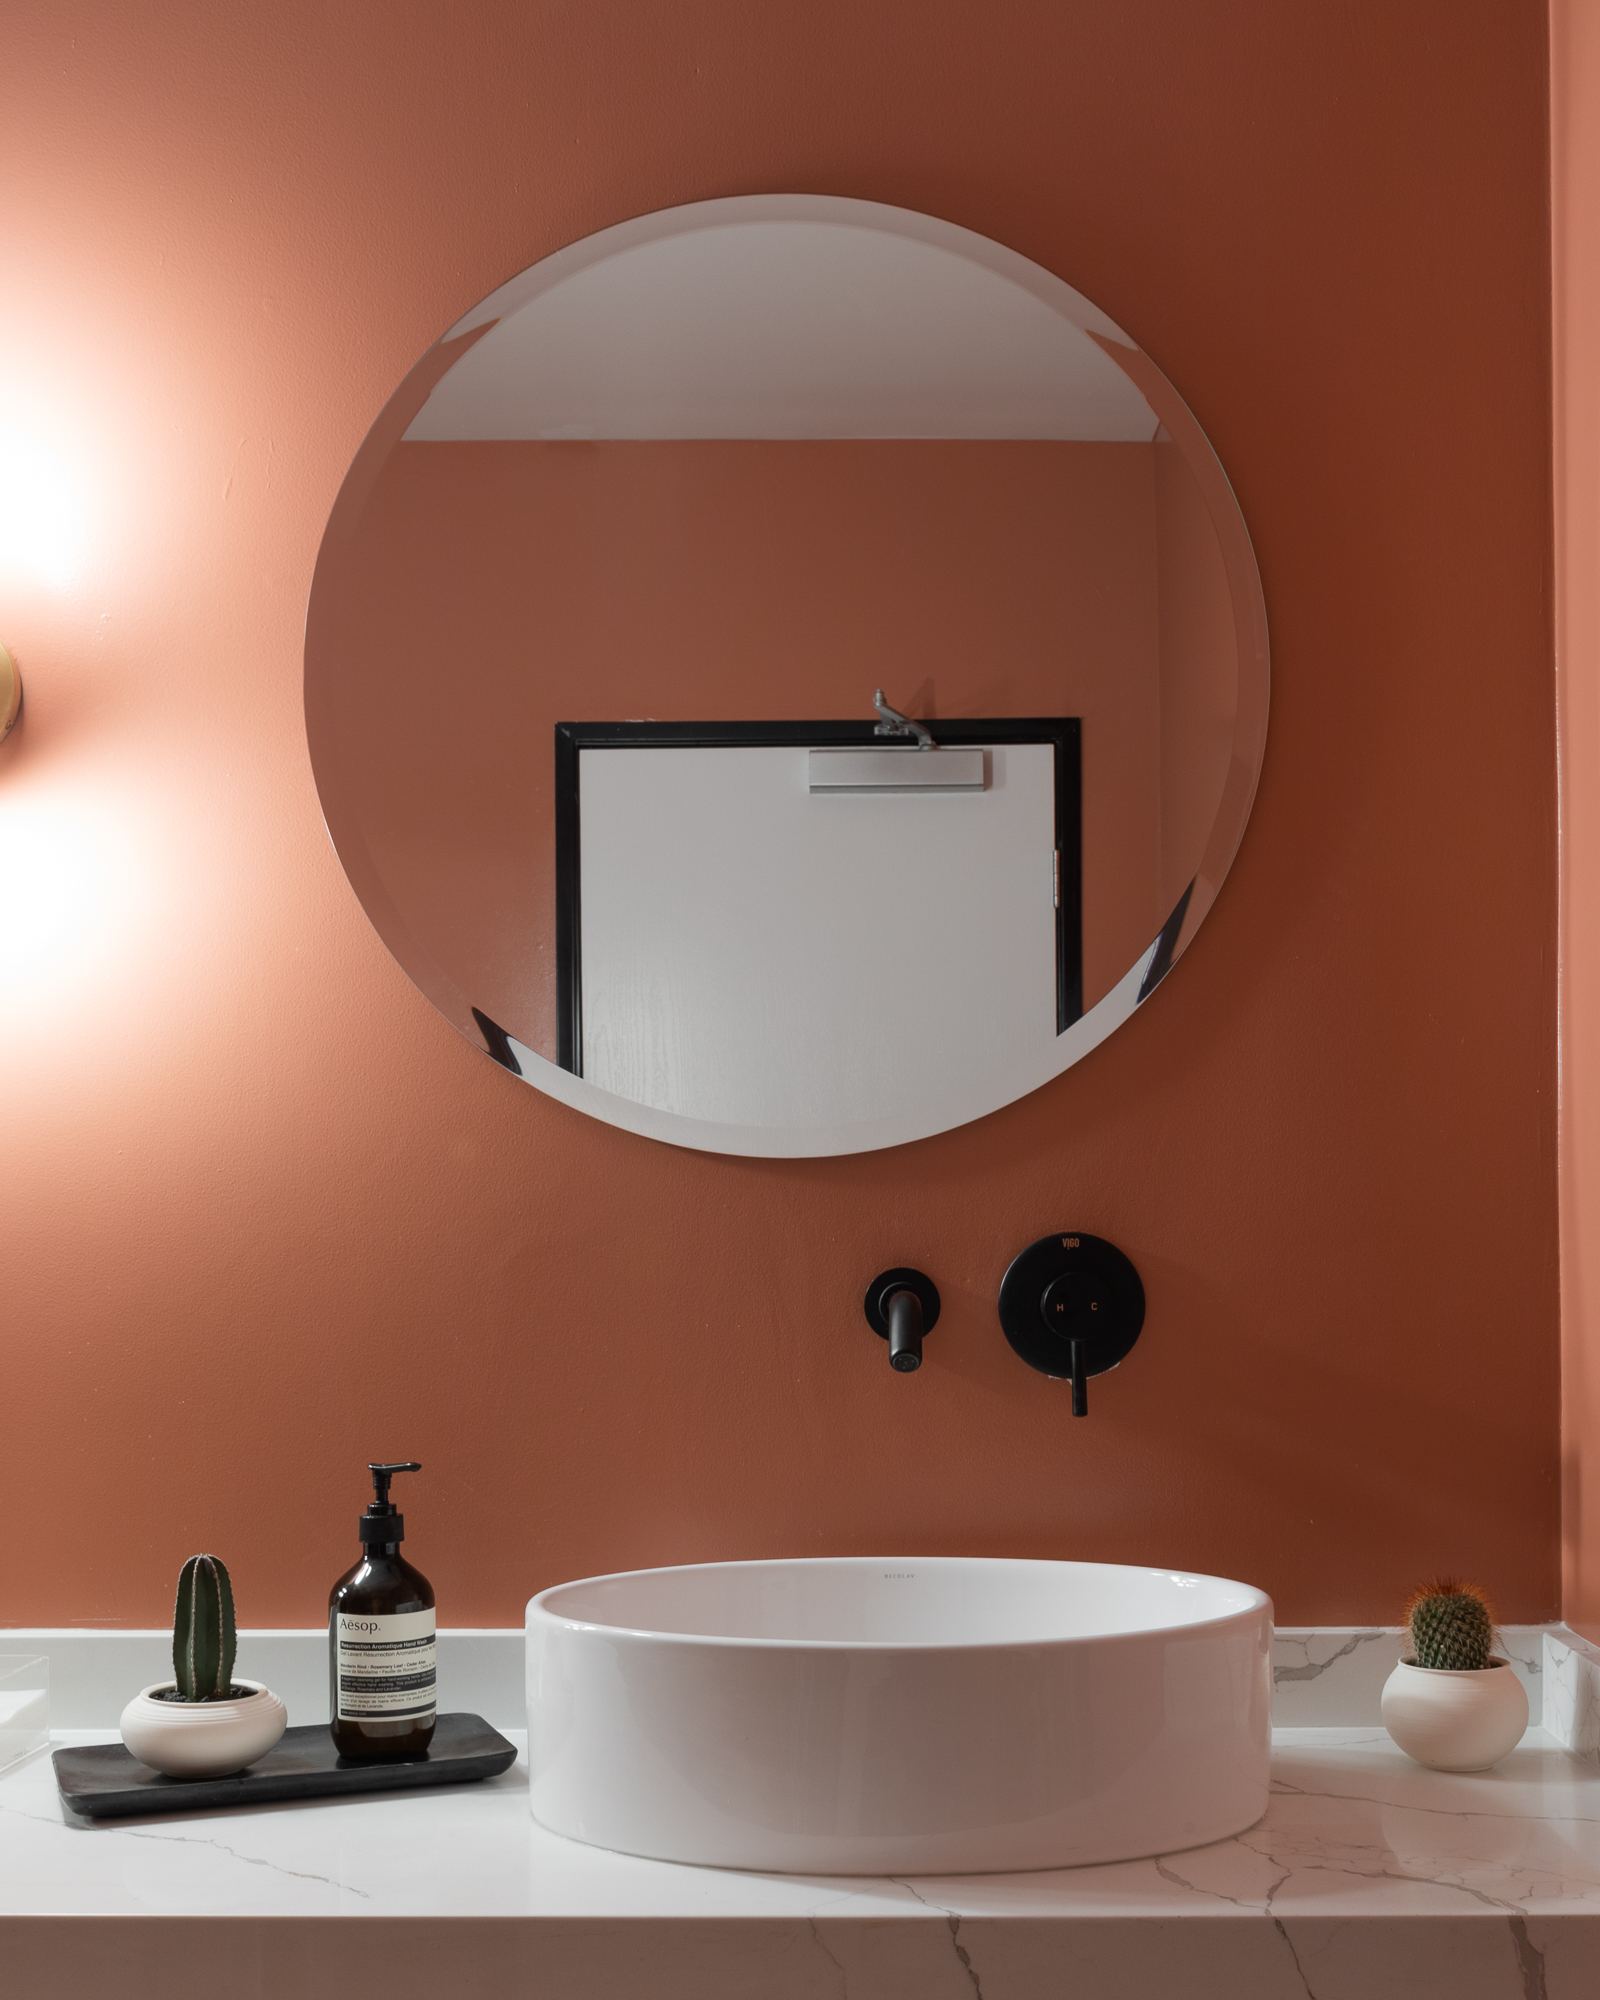 LME_Studios_Bathroom.jpg